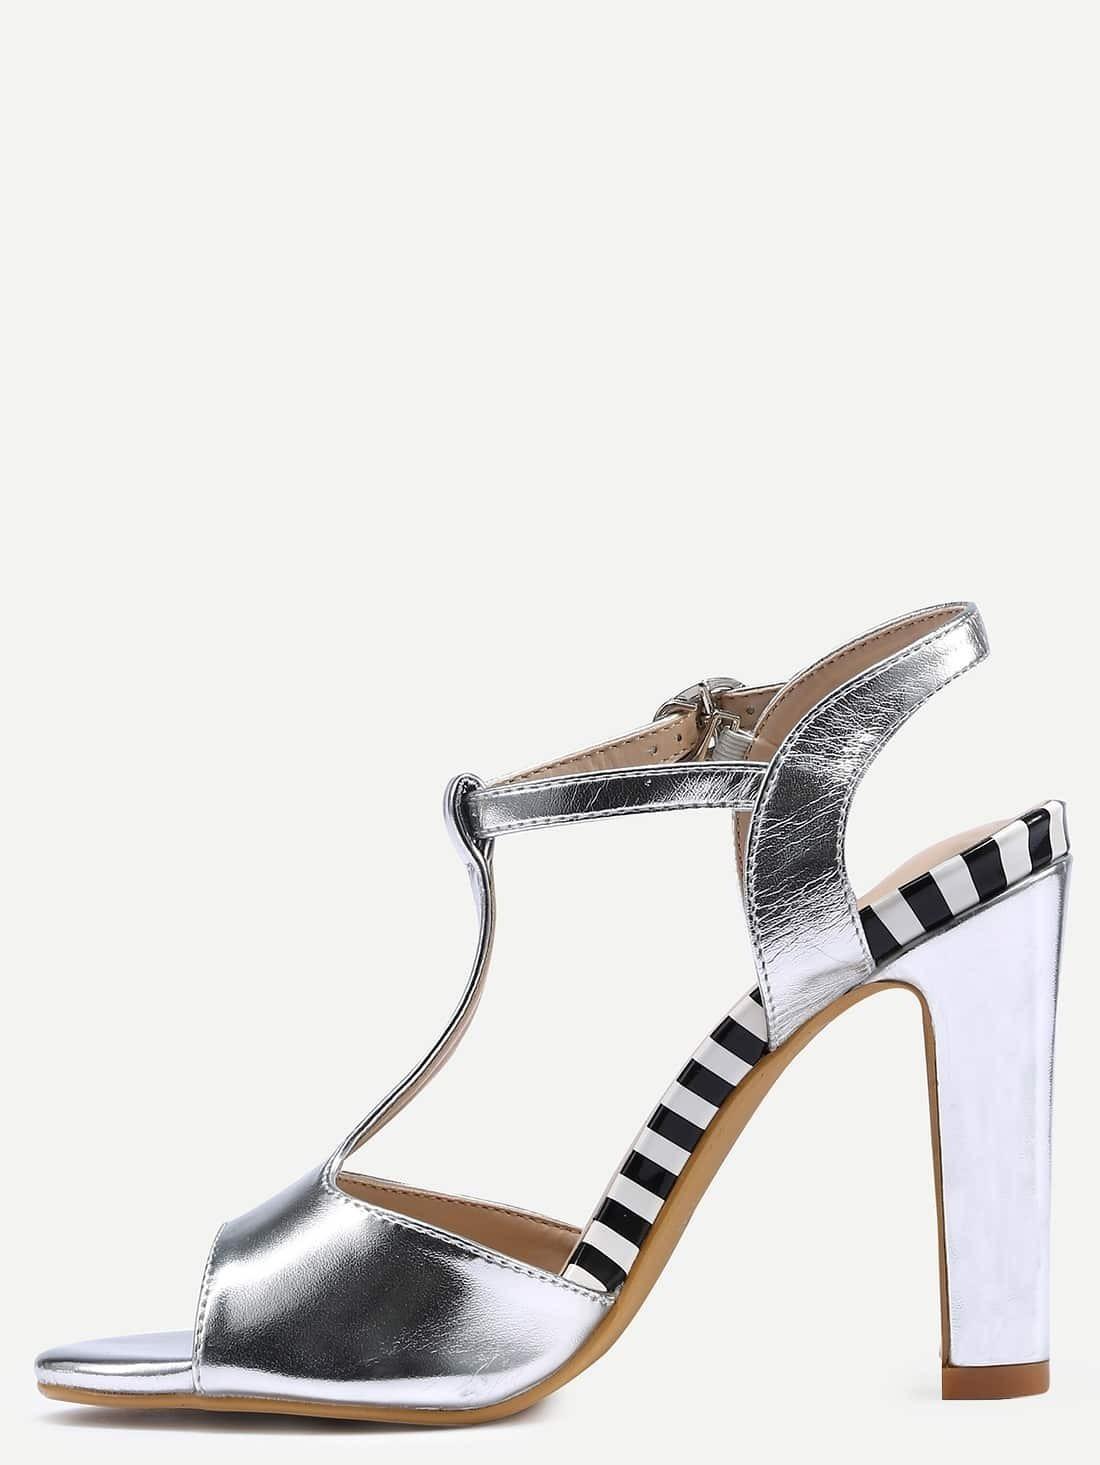 Silver T Strap High Heels